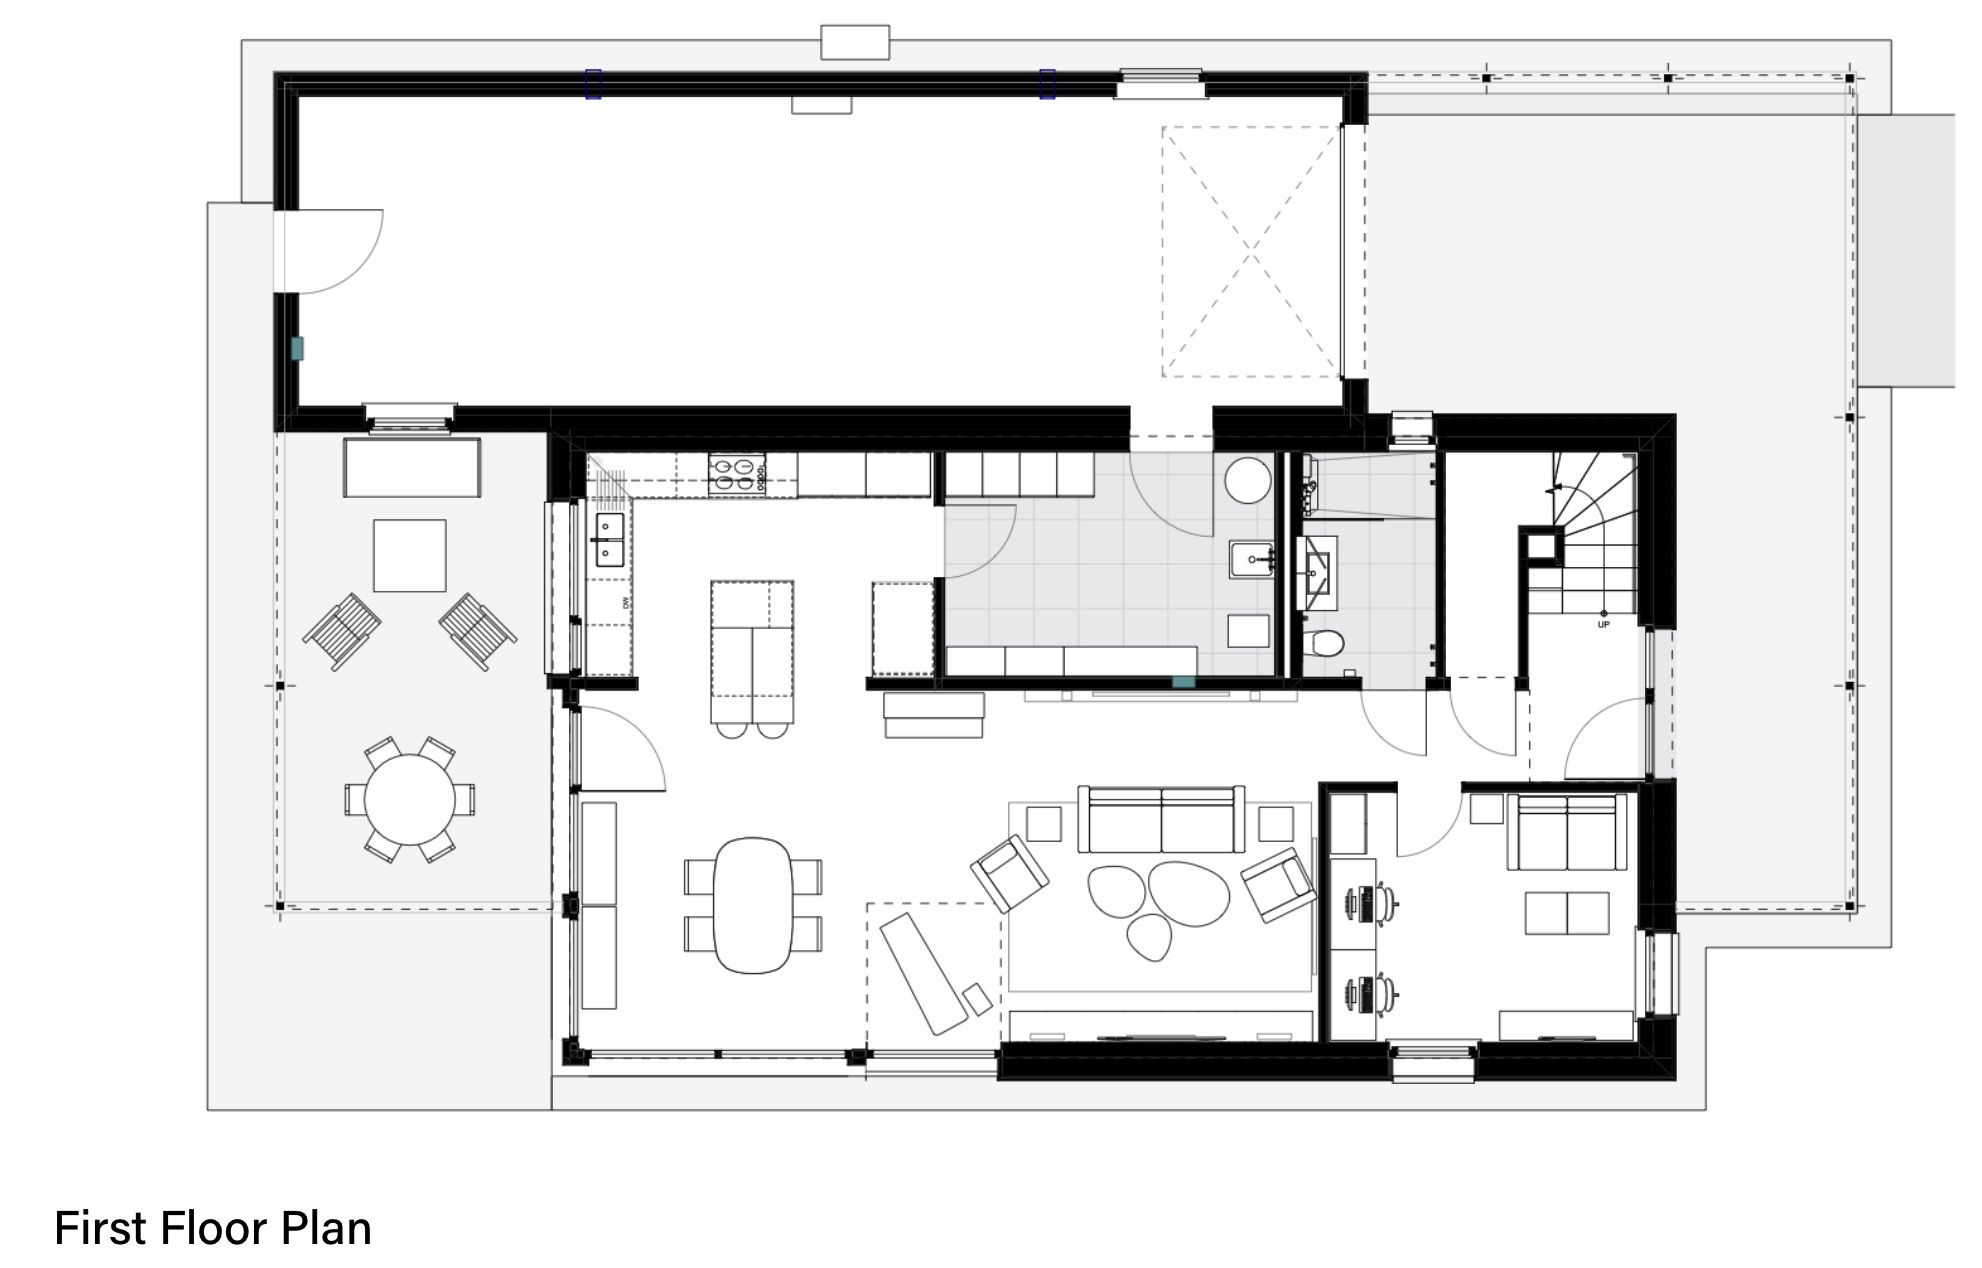 ground floor plan of house